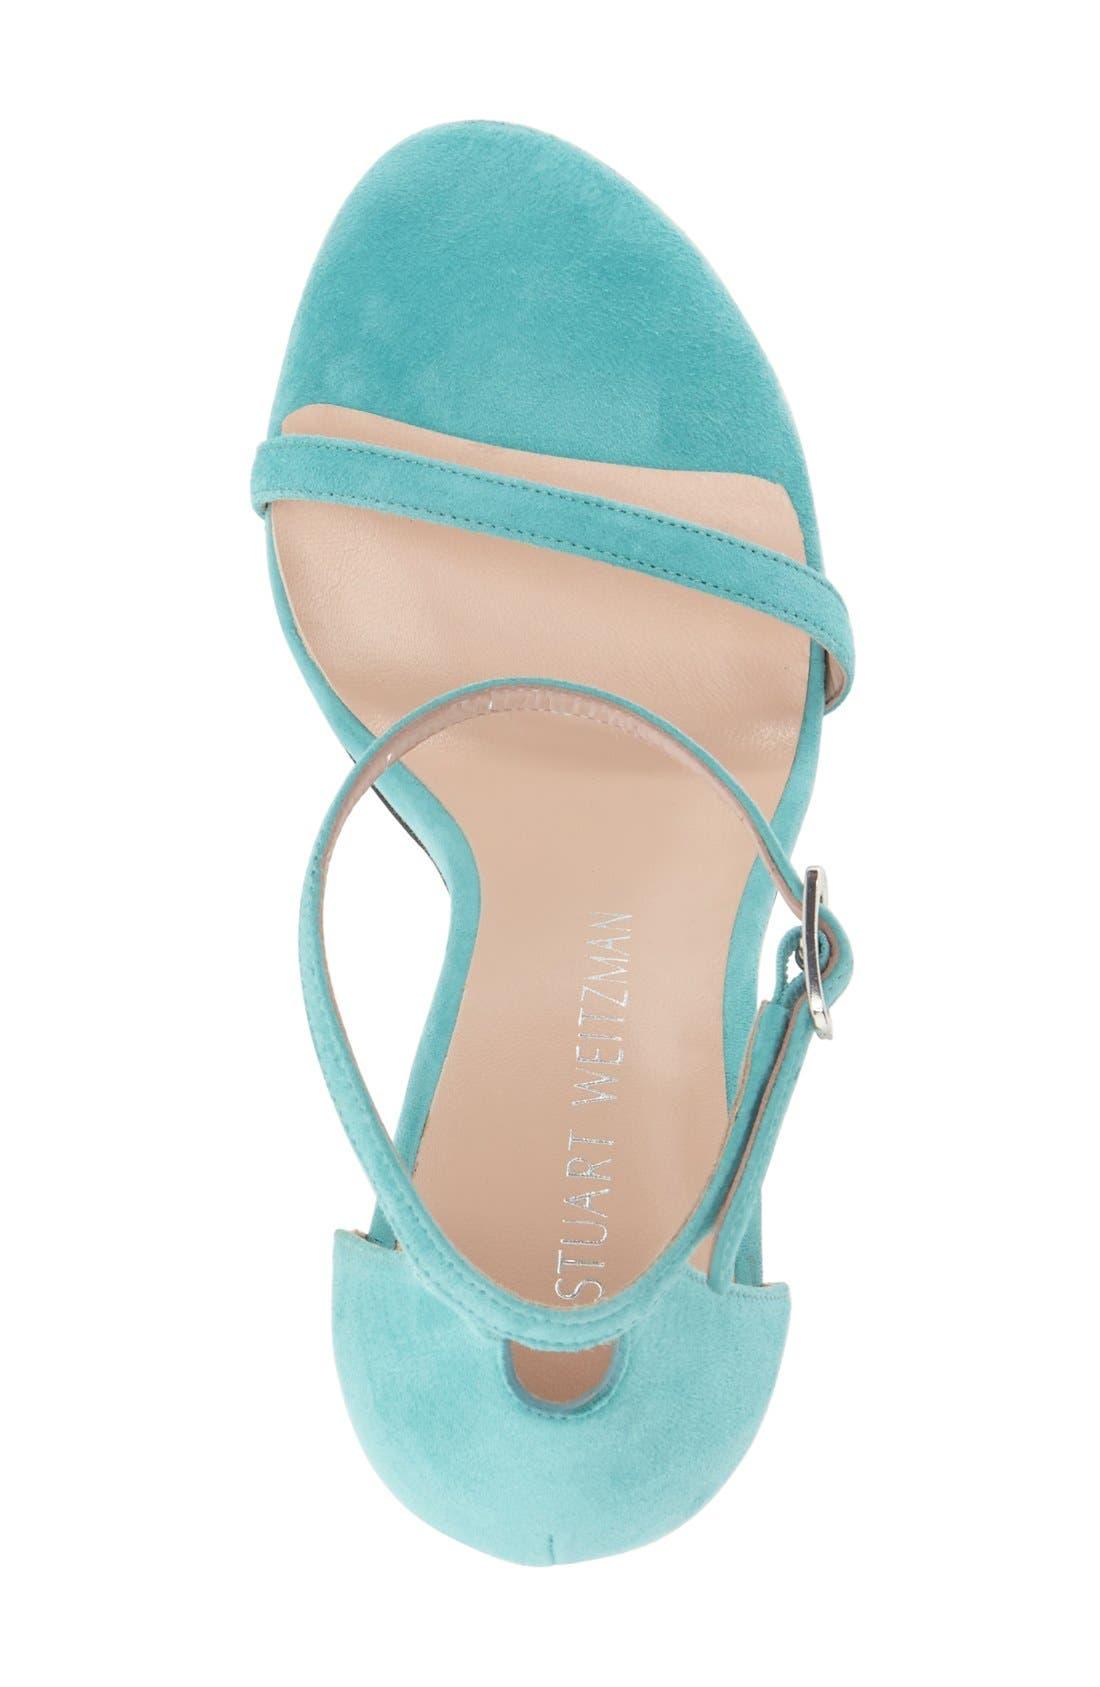 Nudistsong Ankle Strap Sandal,                             Alternate thumbnail 156, color,